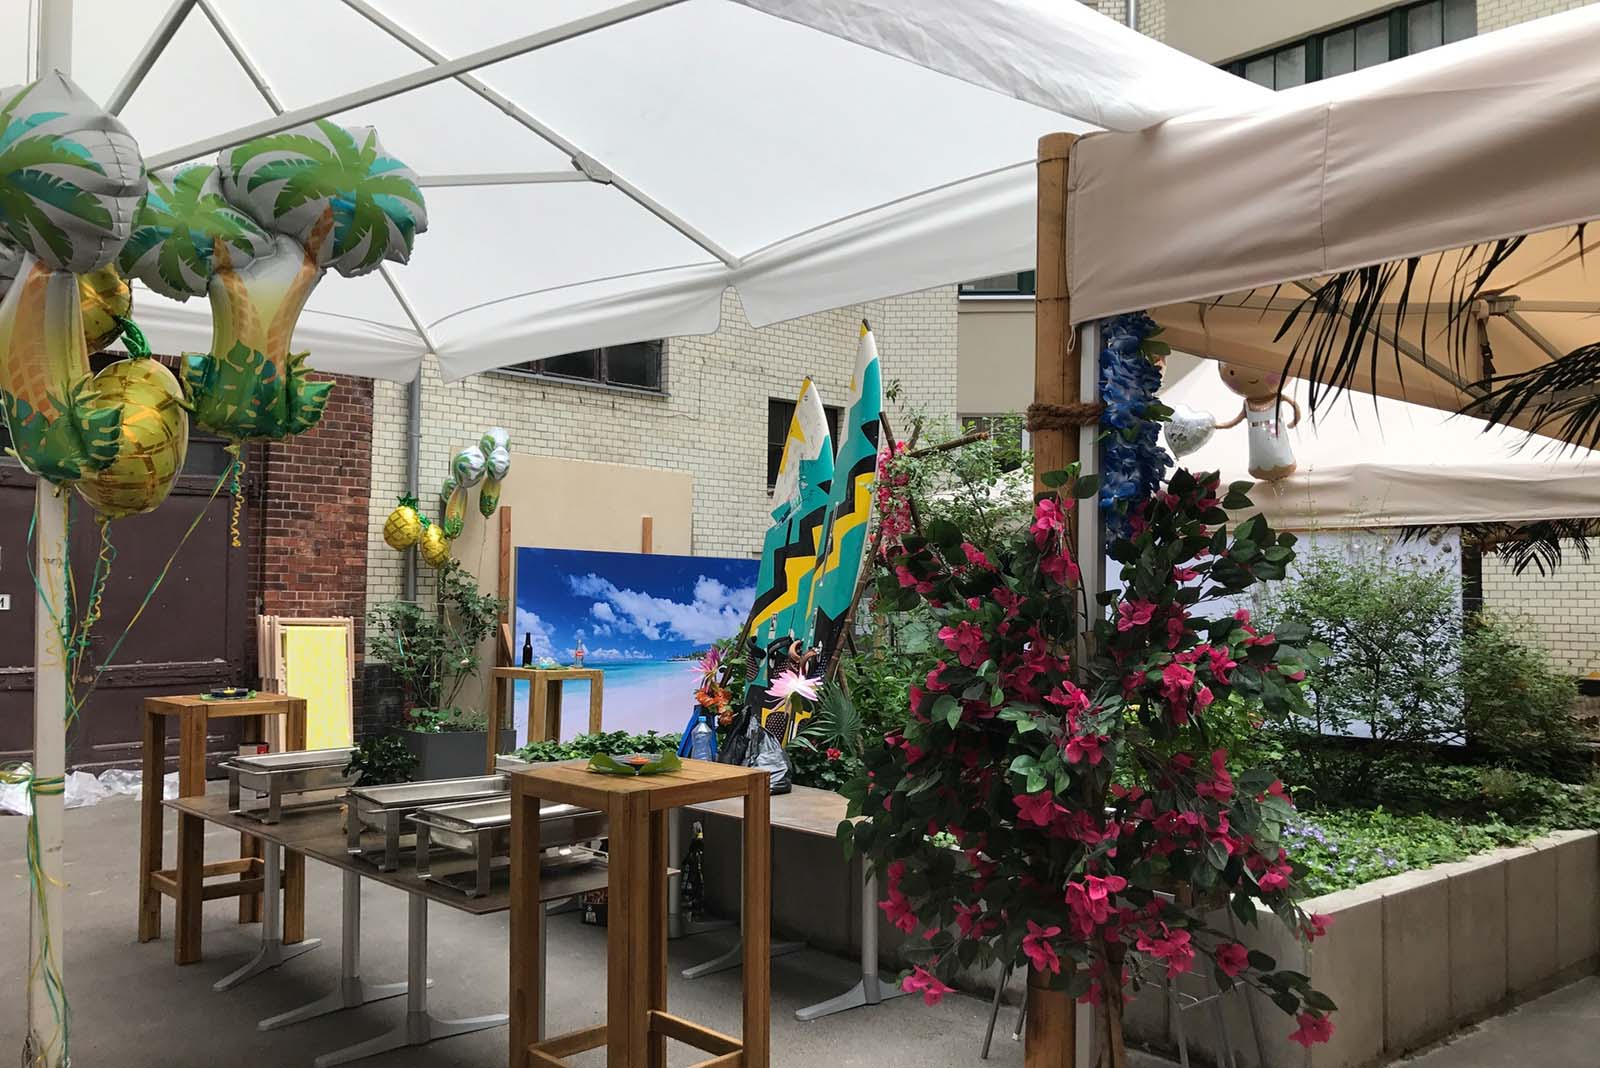 Hawaii Dekoration Event Agentur creative Service Drummer, Berlin